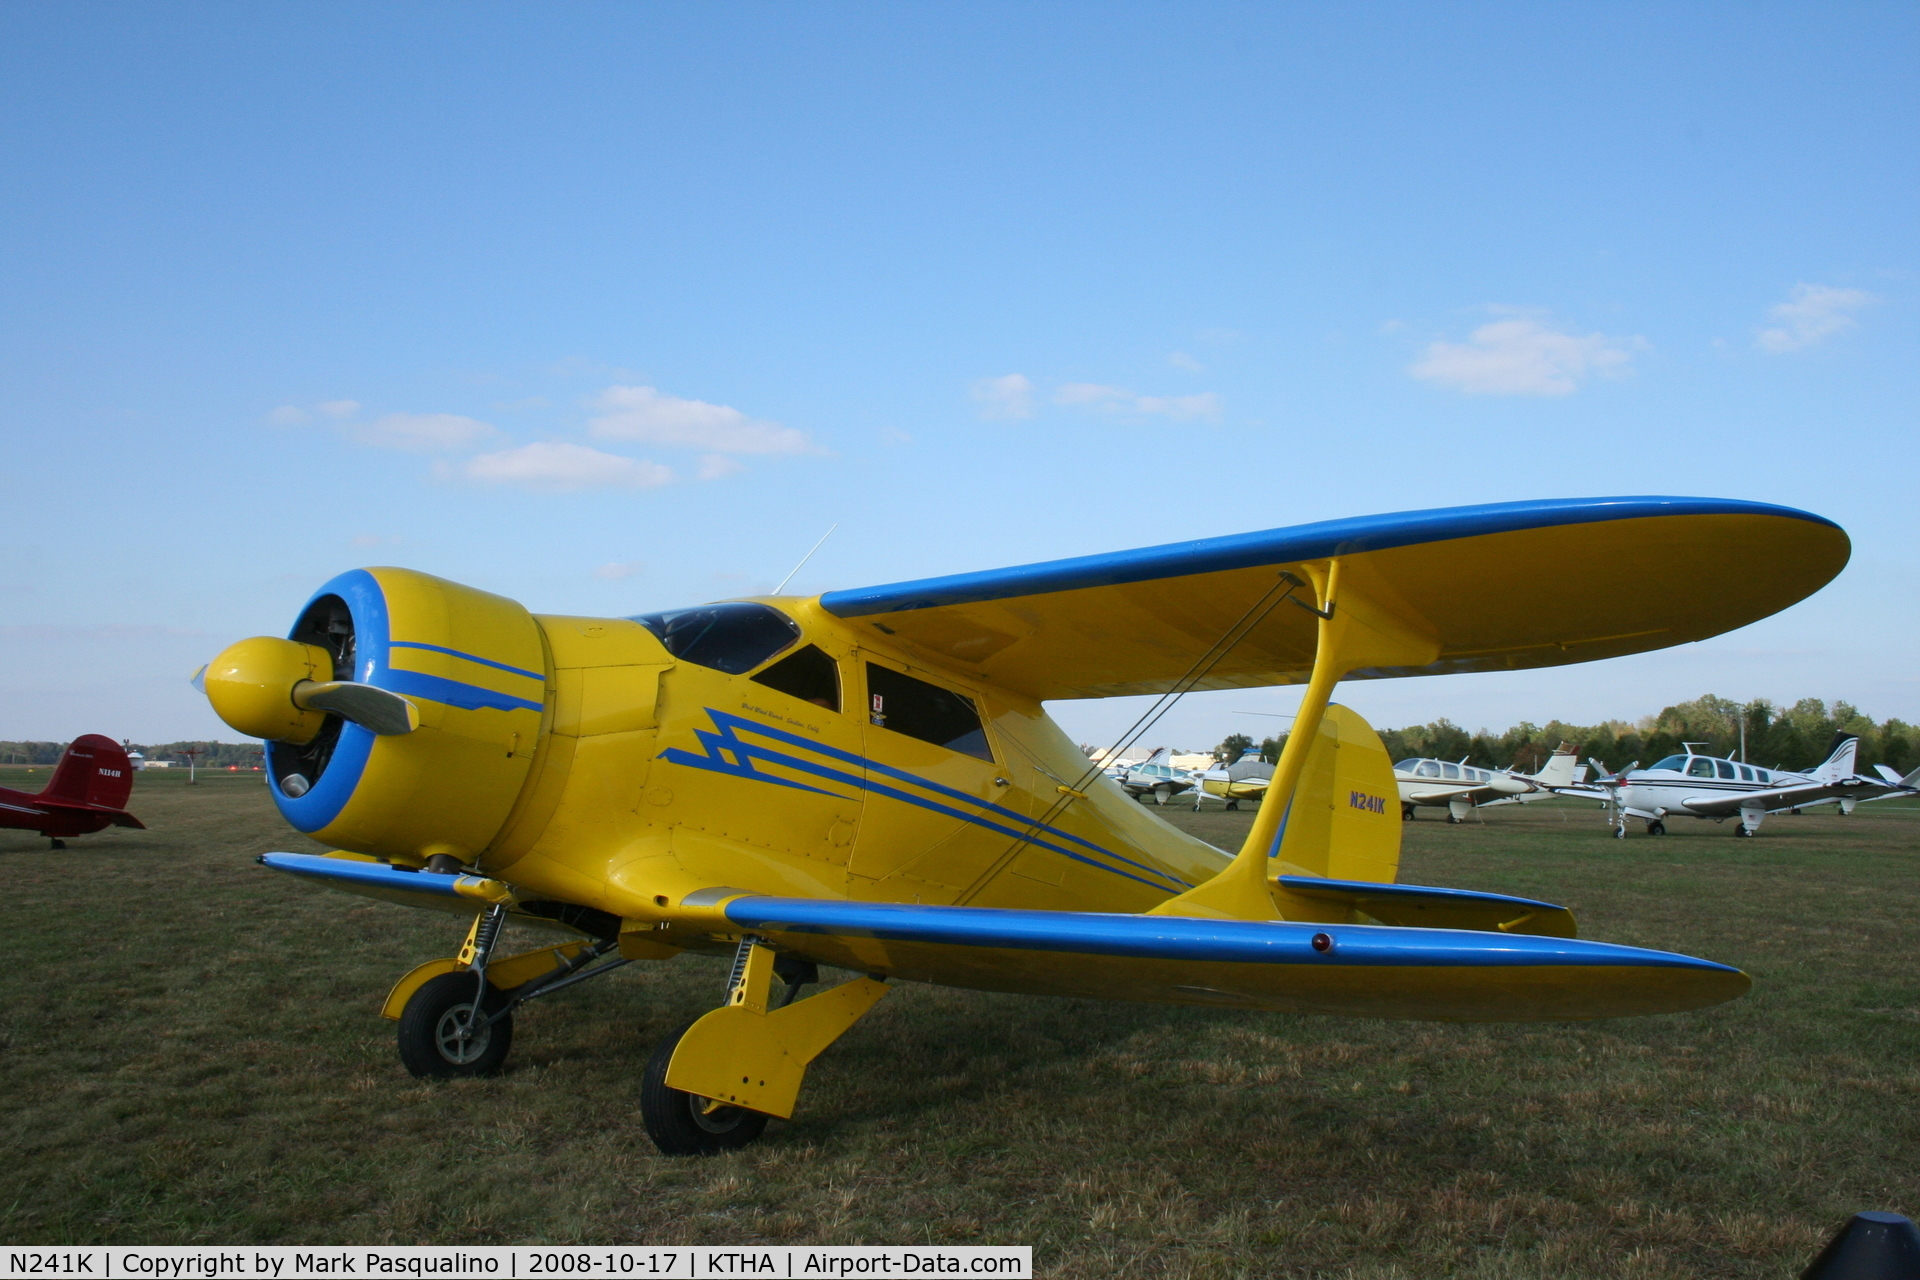 N241K, 1939 Beech D17S Staggerwing C/N 287, Beech D17S